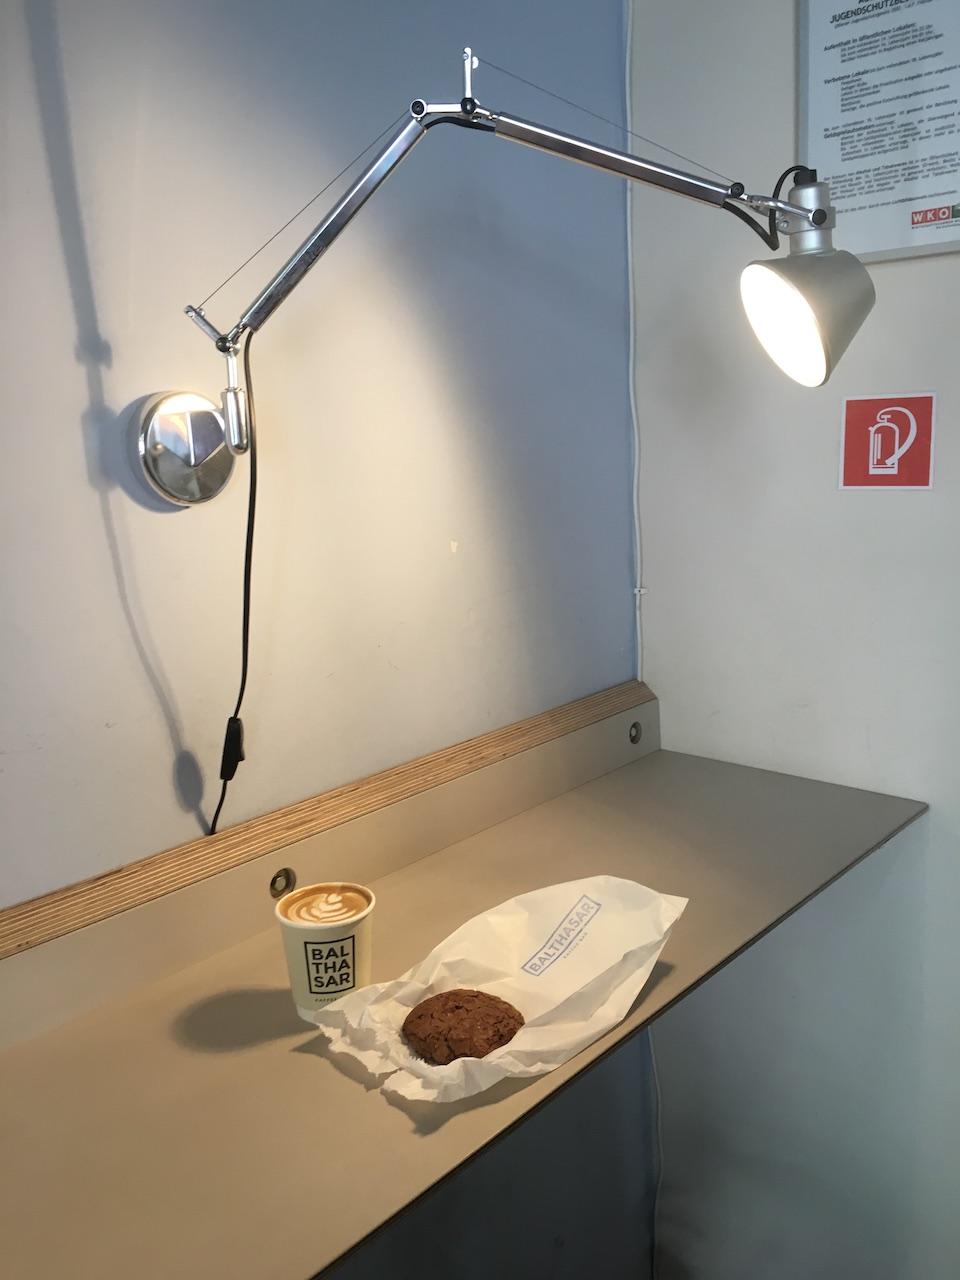 balthasar_coffee_lamp_960w.jpg